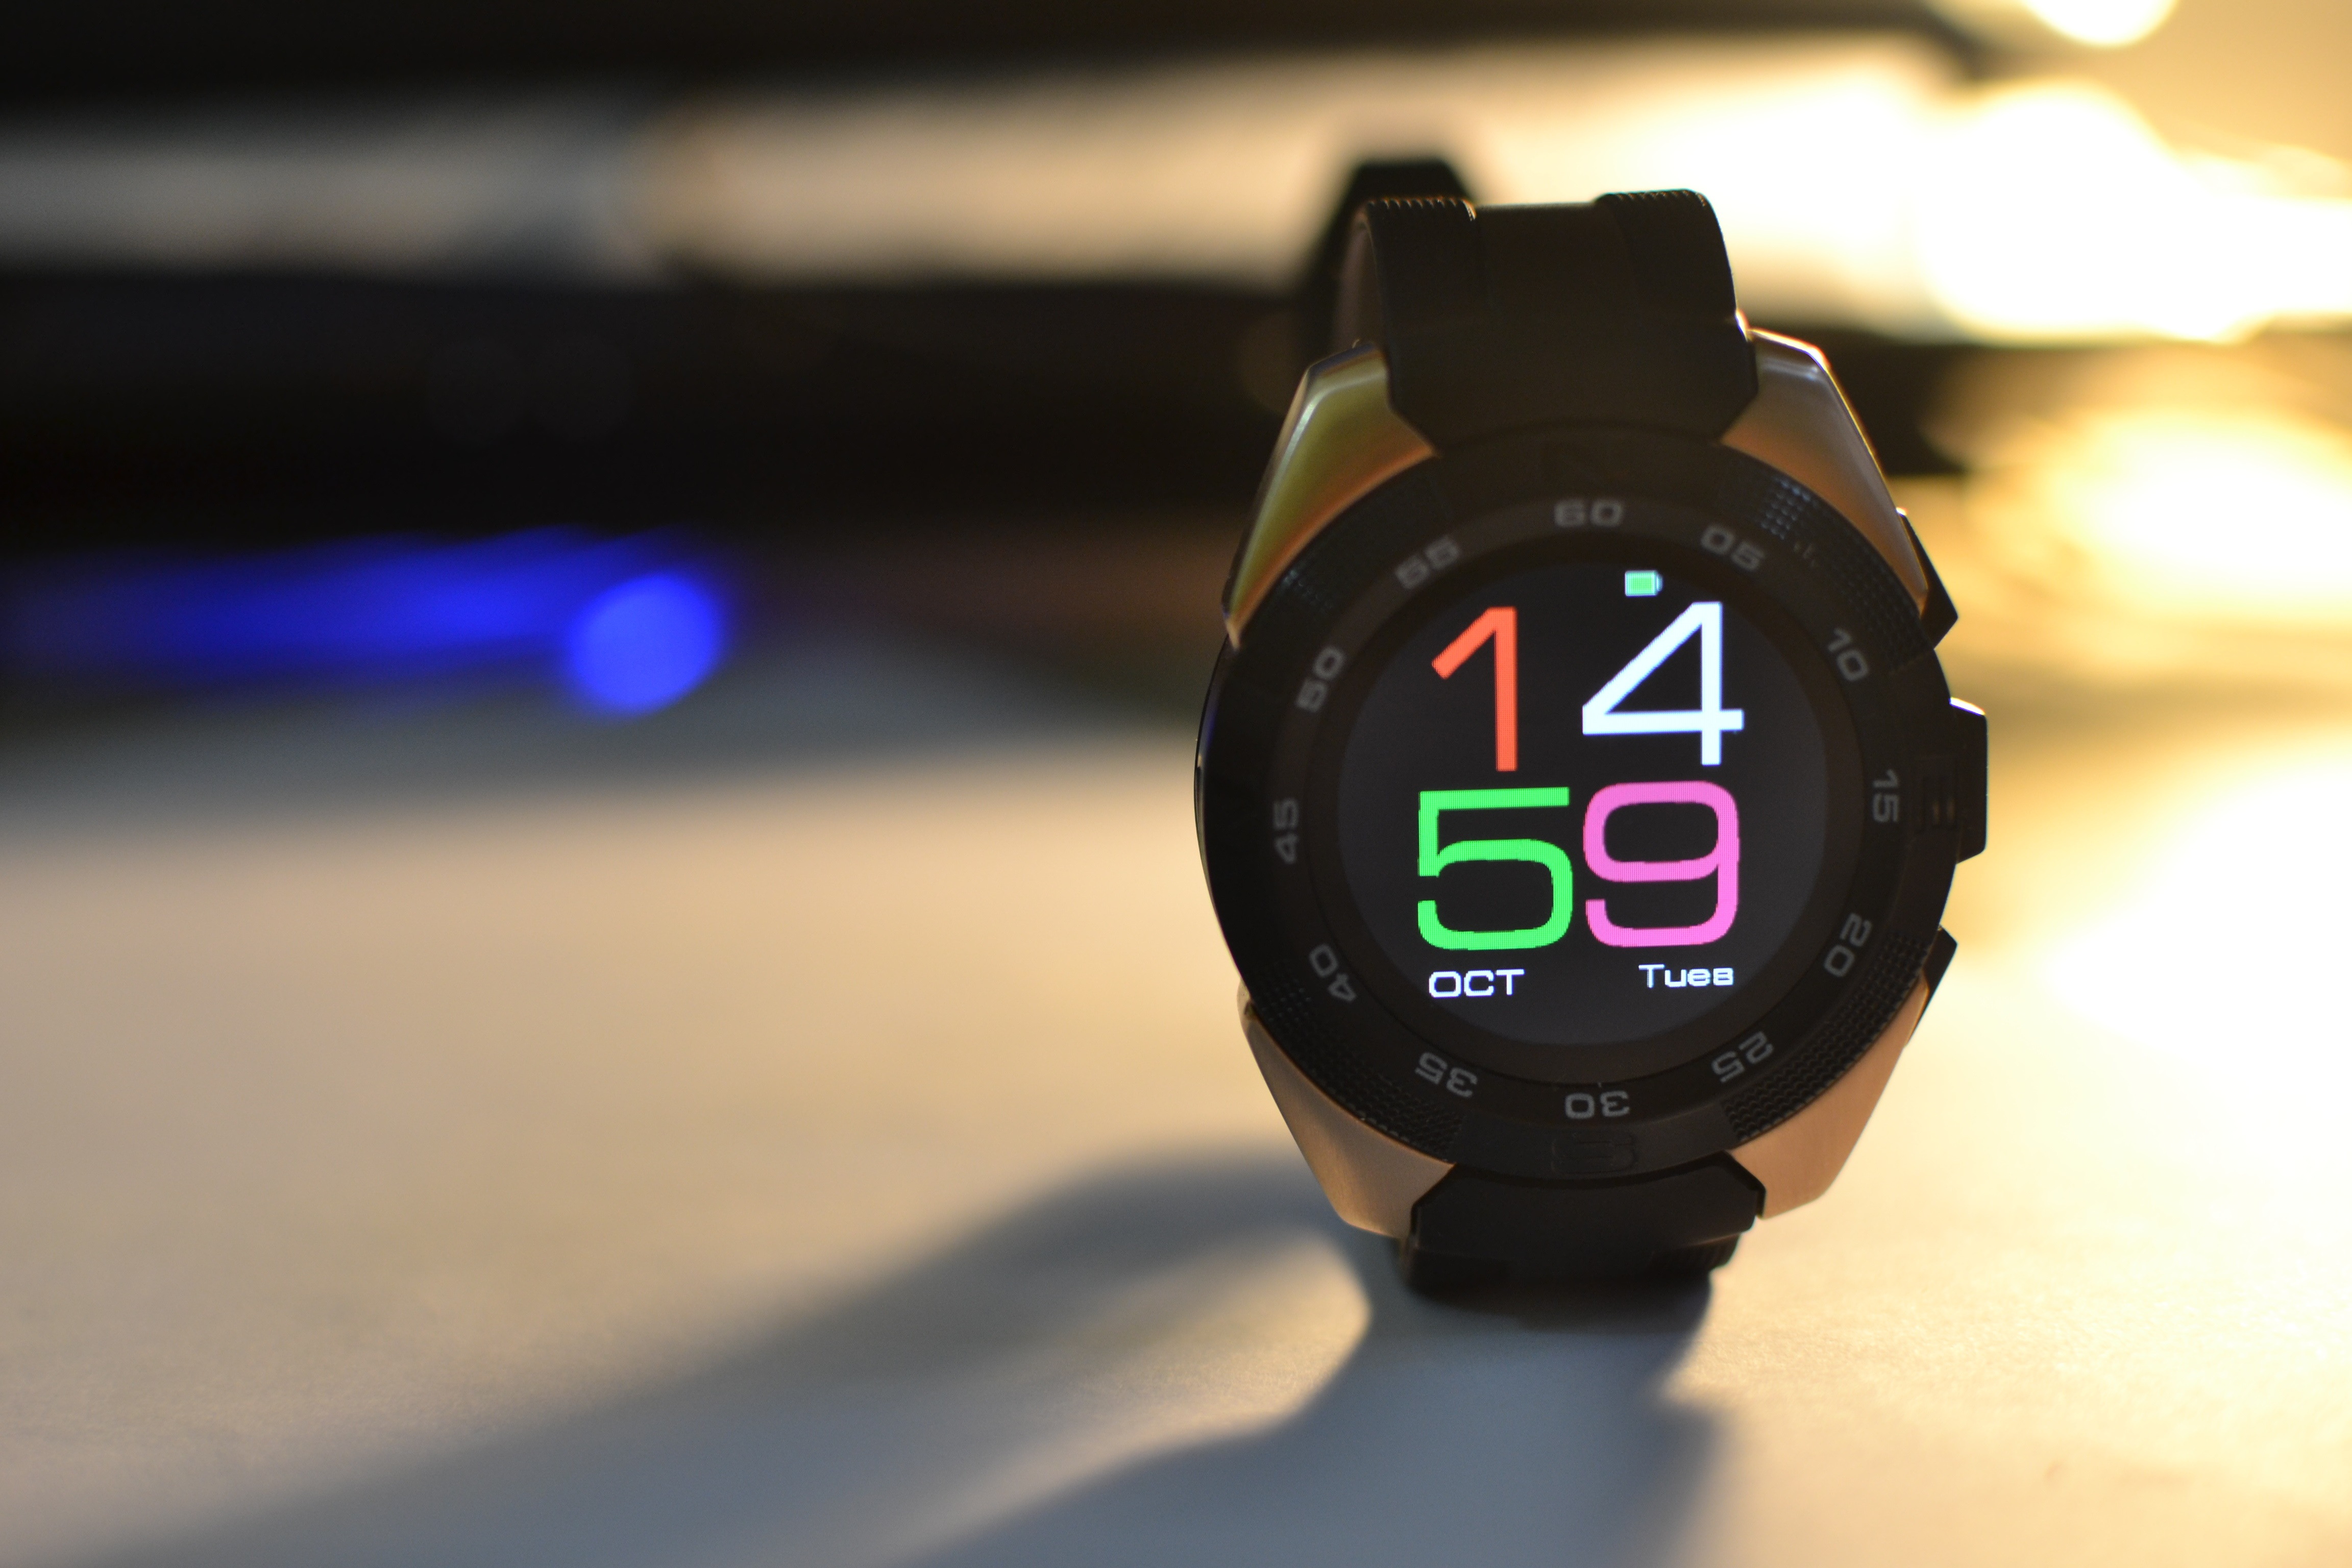 Chytré hodinky NO.1 G5 za tisíc korun [minirecenze]